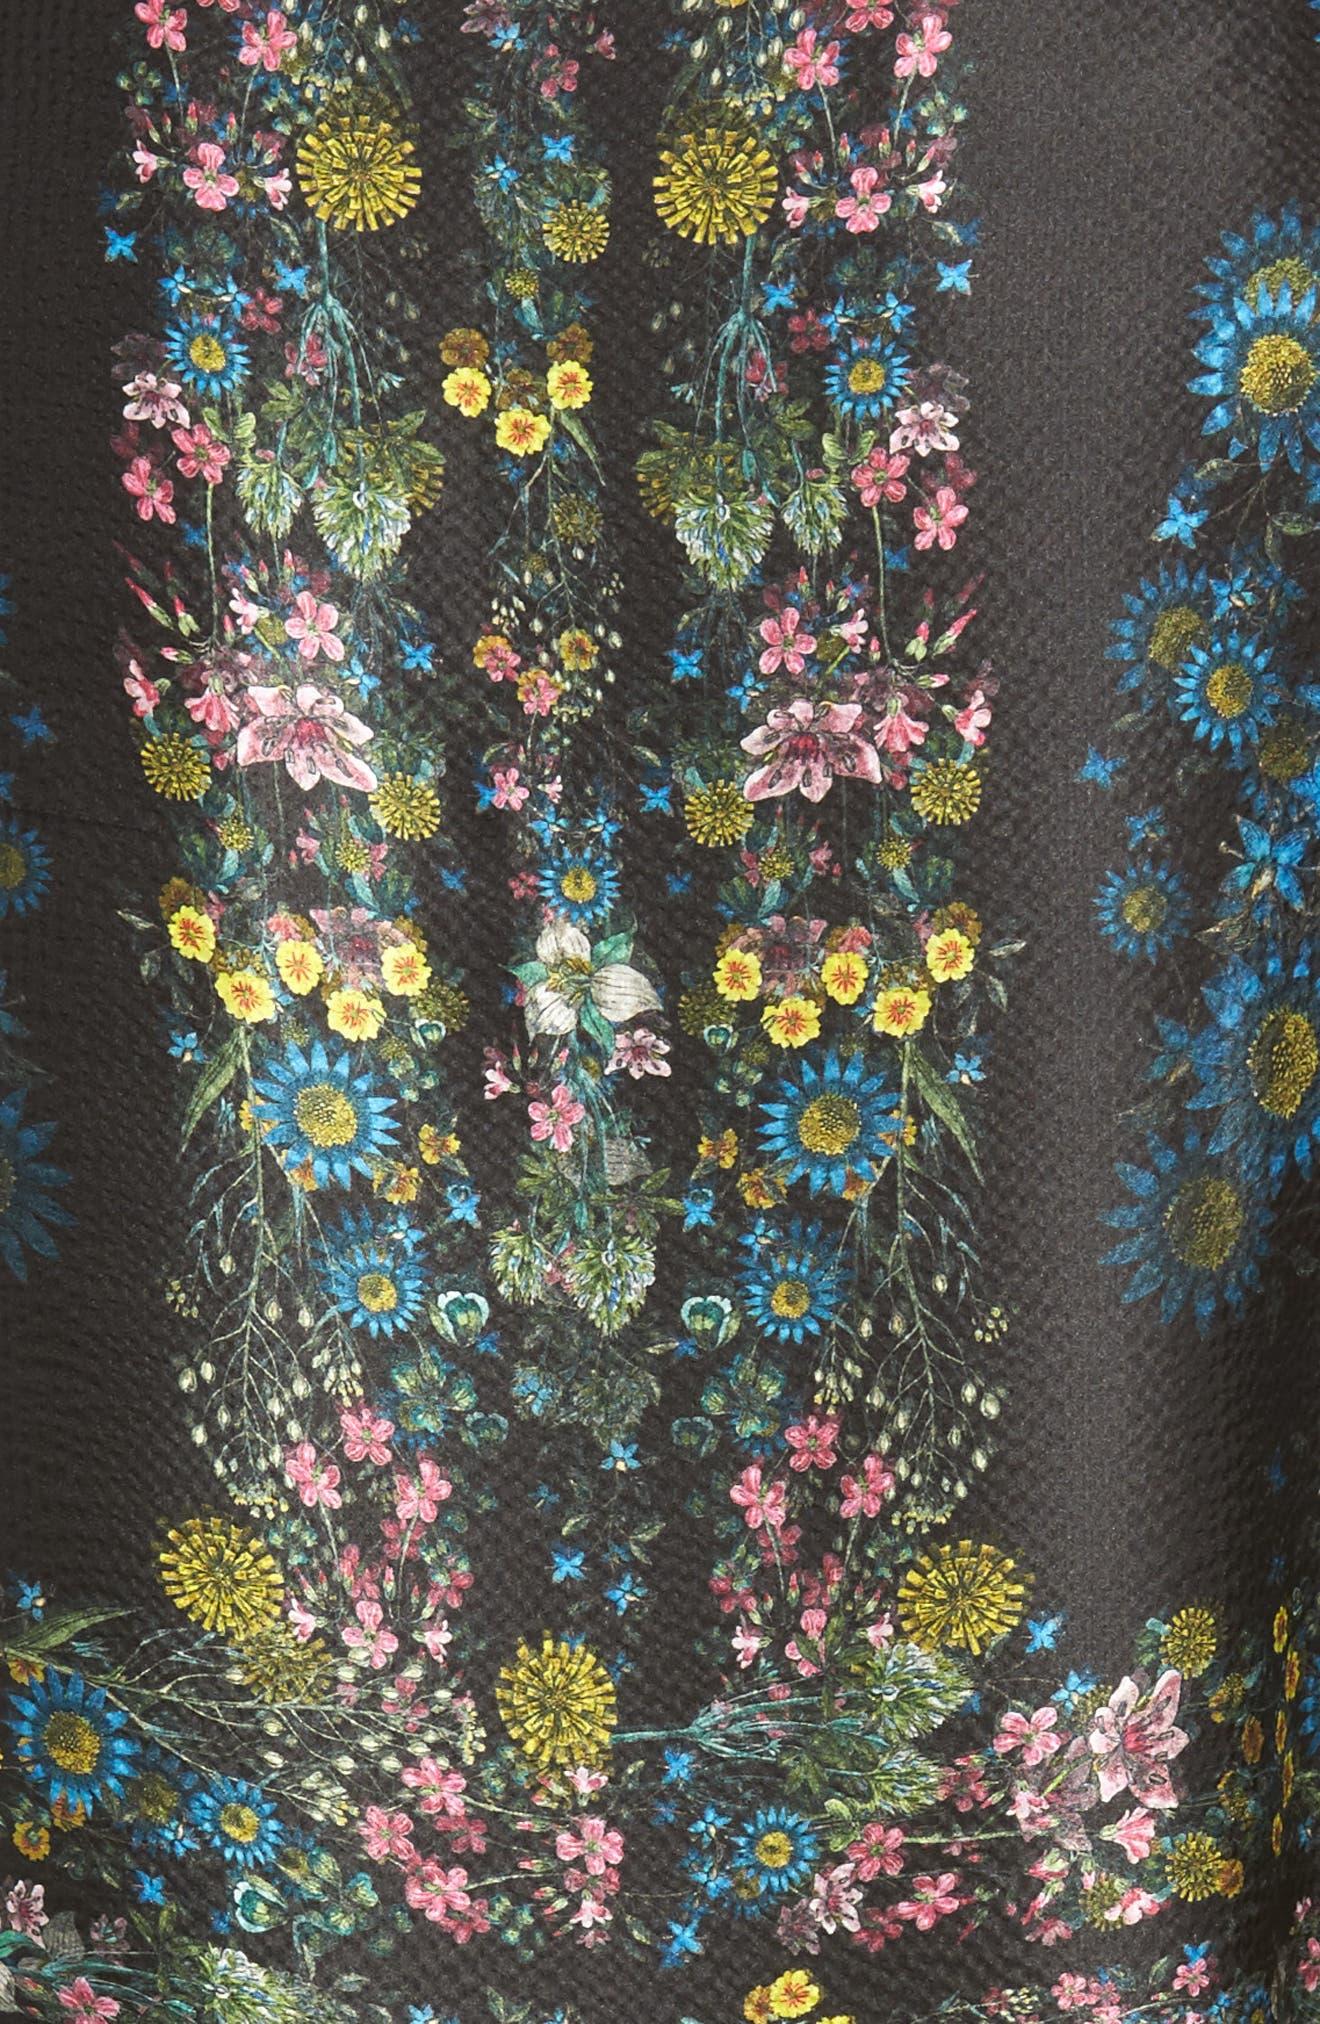 Unity Floral Silk Cape Scarf,                             Alternate thumbnail 5, color,                             001